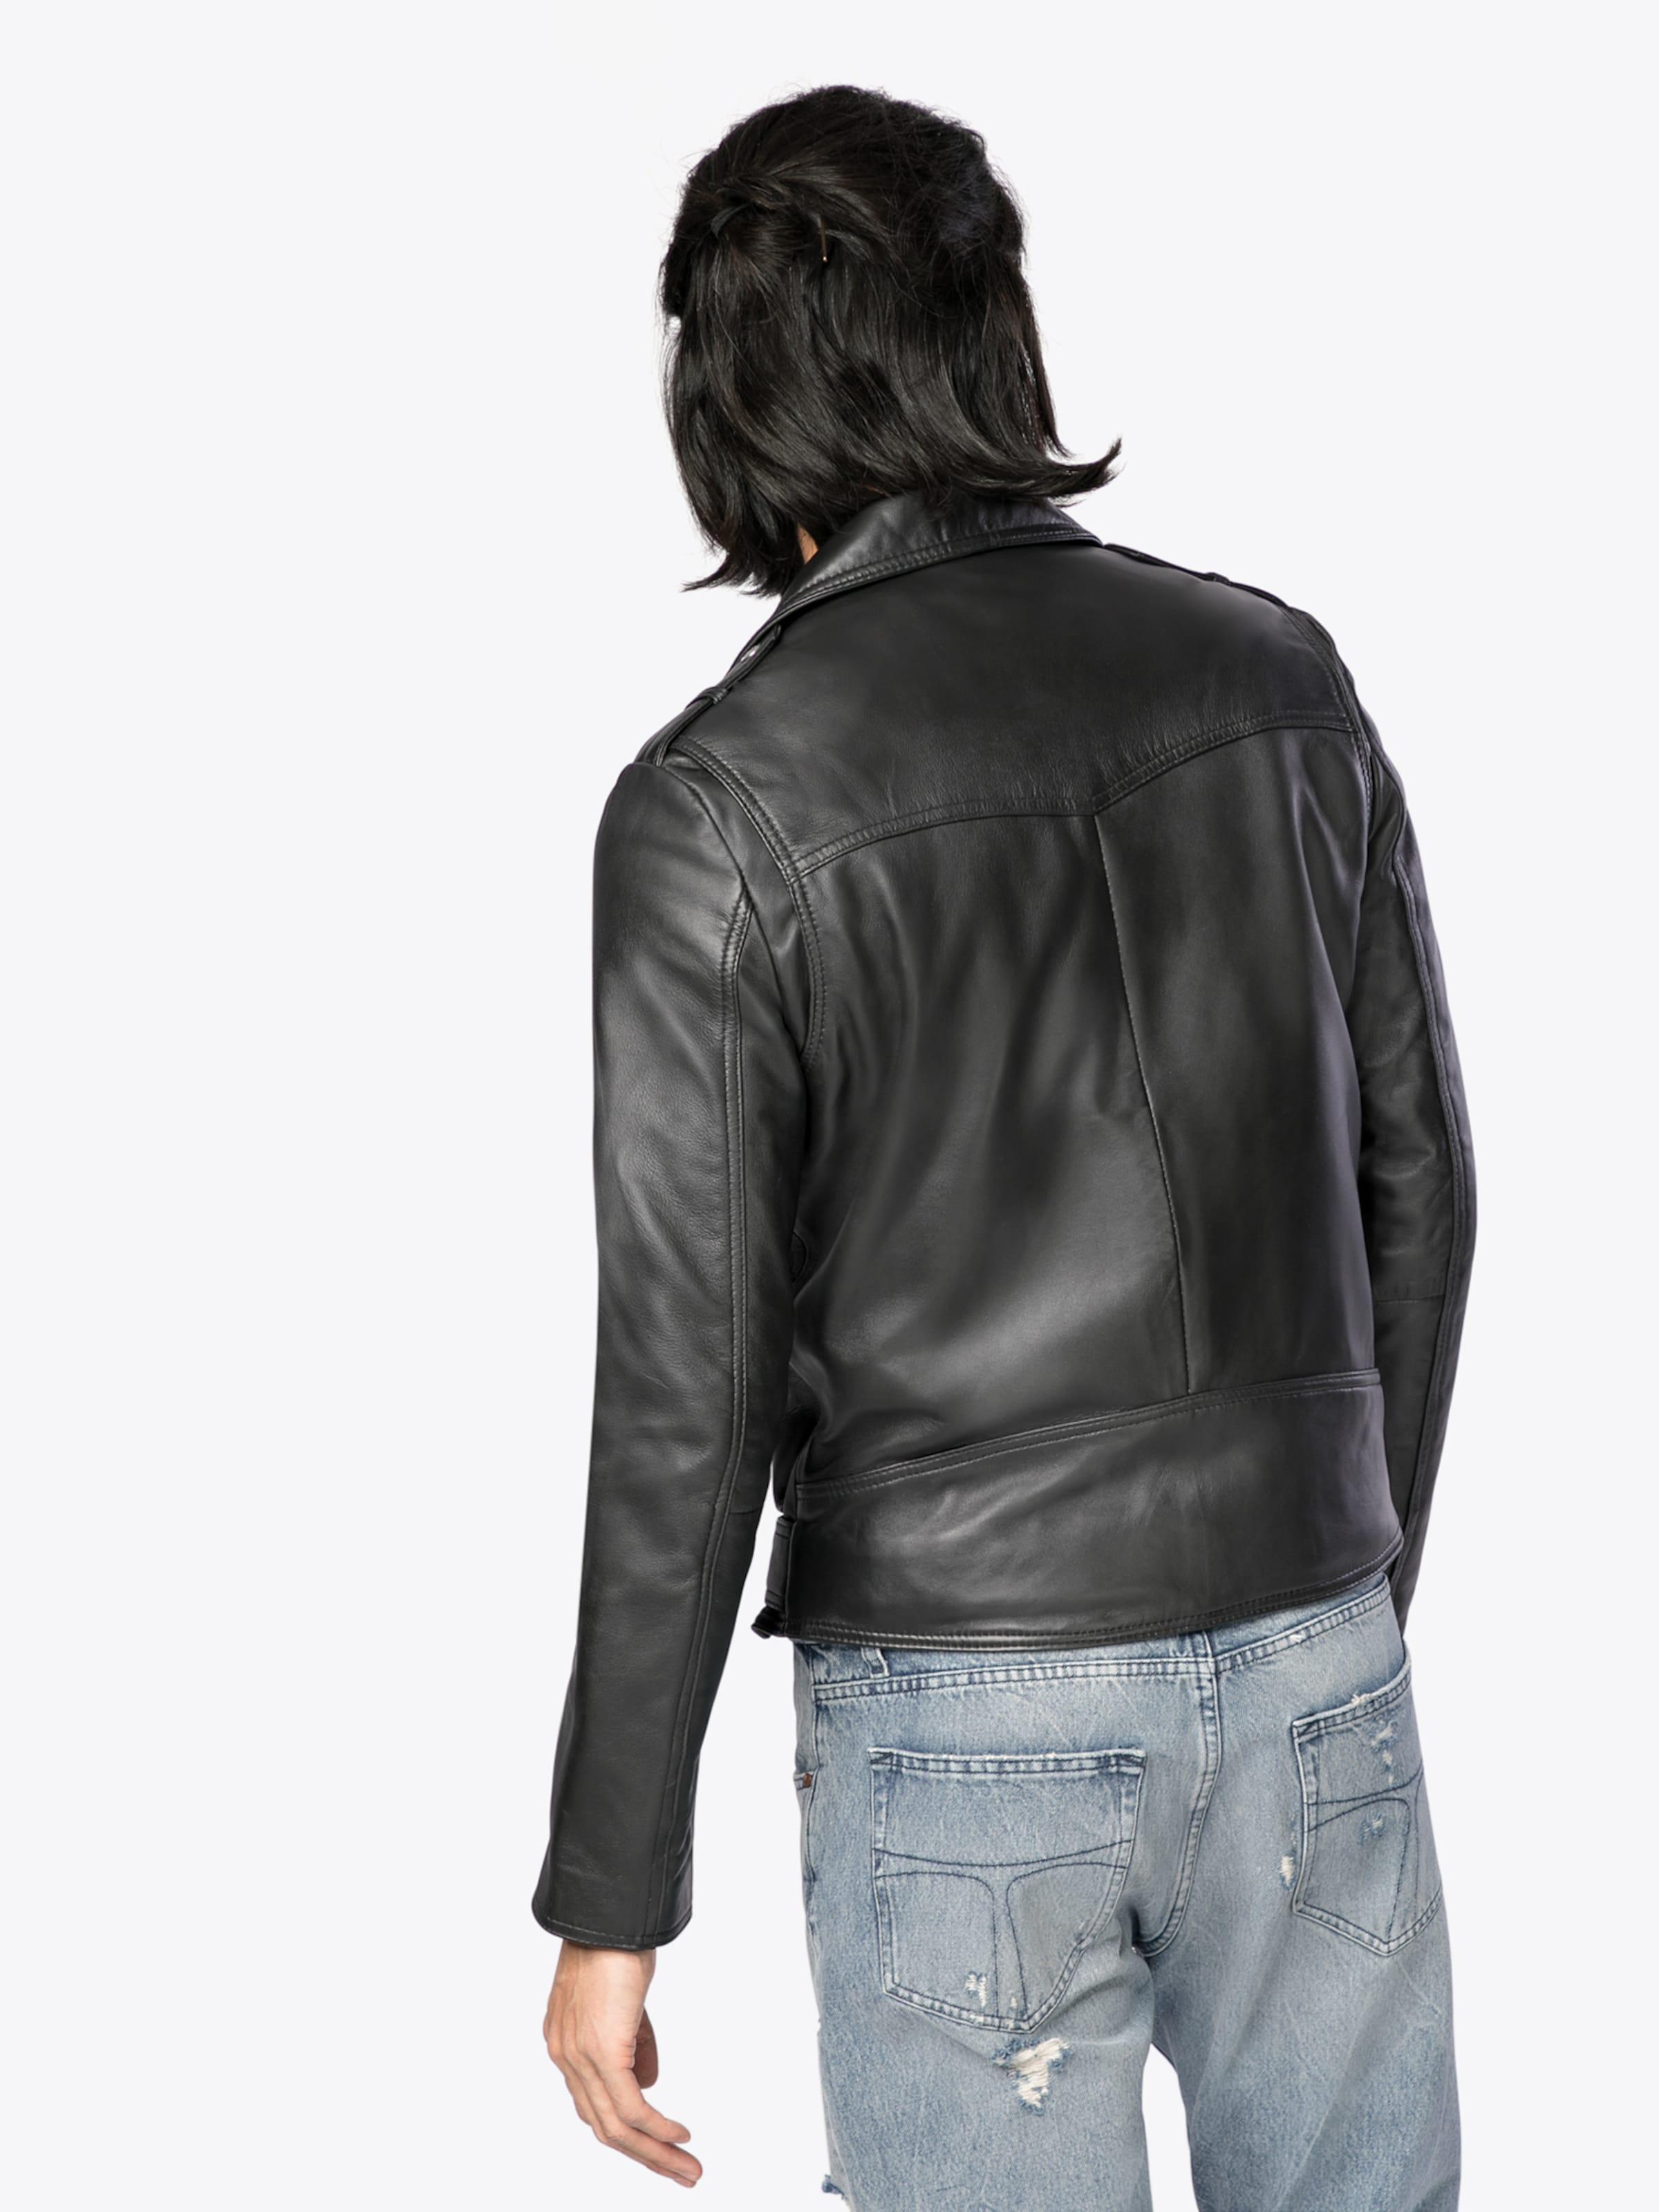 #LADC Lederjacke 'Rocky' Kaufen Sie Günstig Online Preis Auslass Perfekt P65P2gB